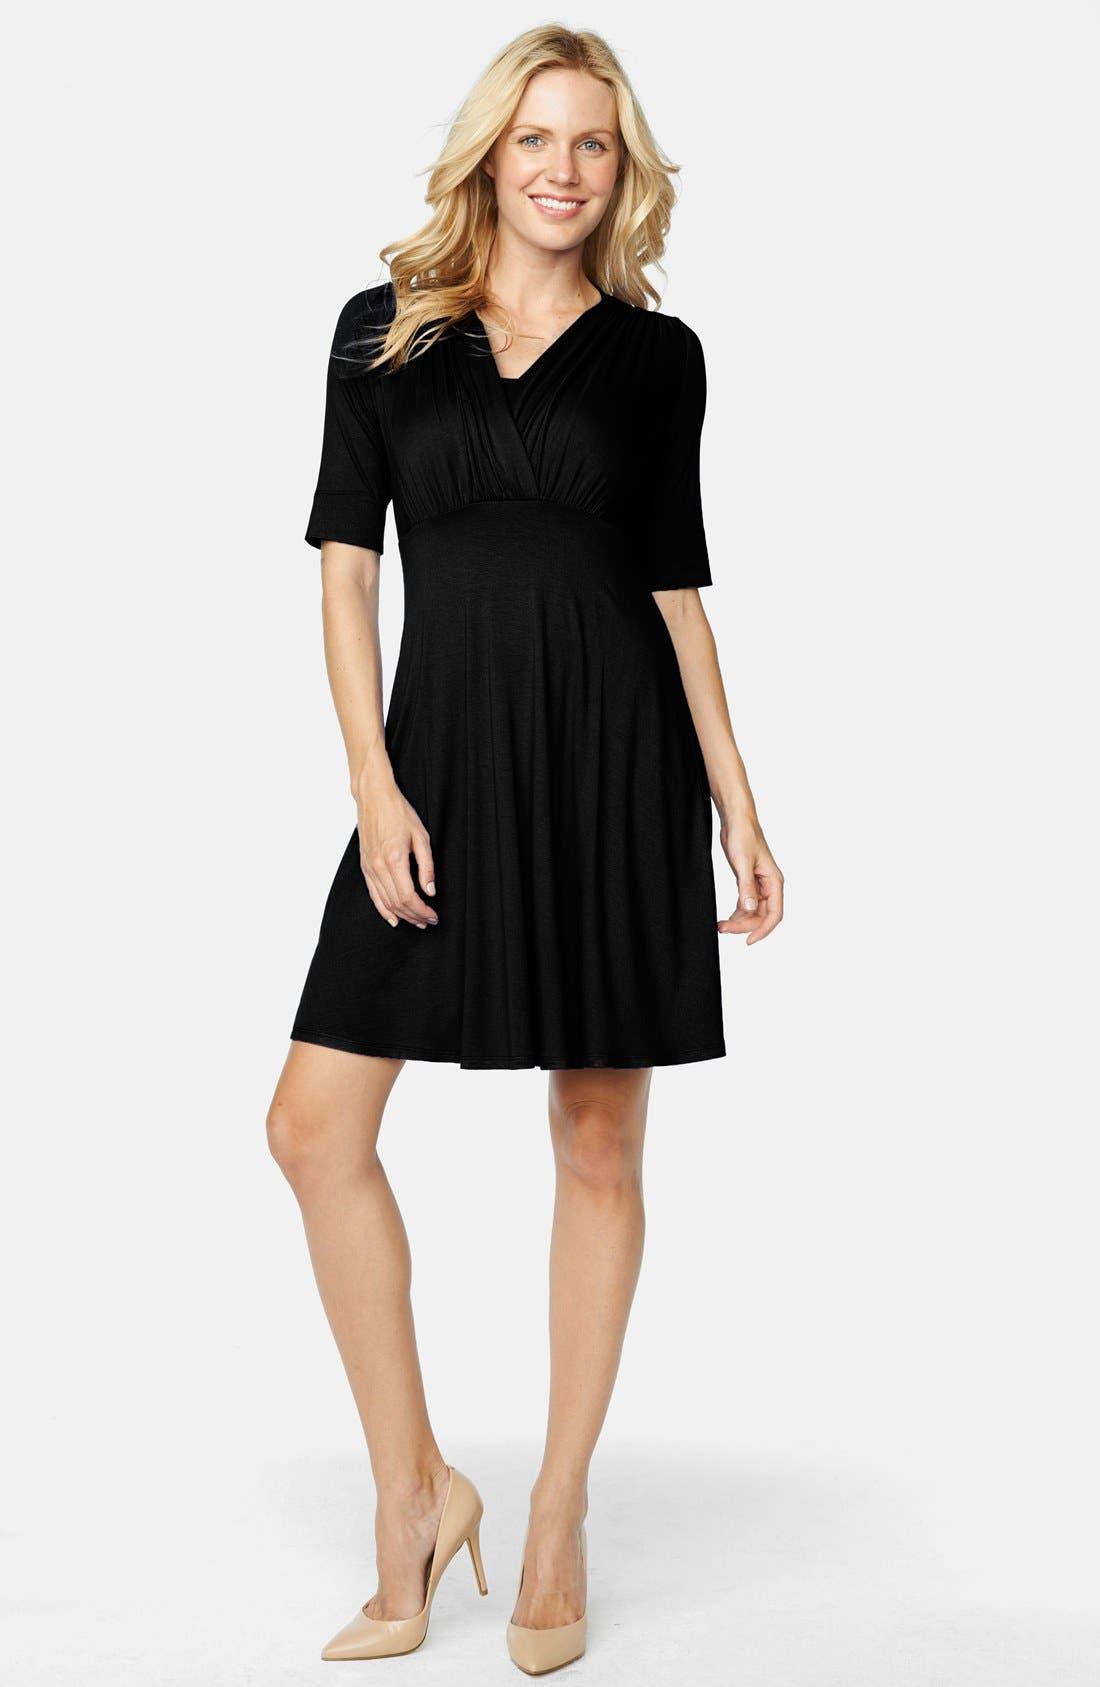 Main Image - Maternal America 'Tummy Tuck' Maternity/Nursing Three Quarter Sleeve Dress